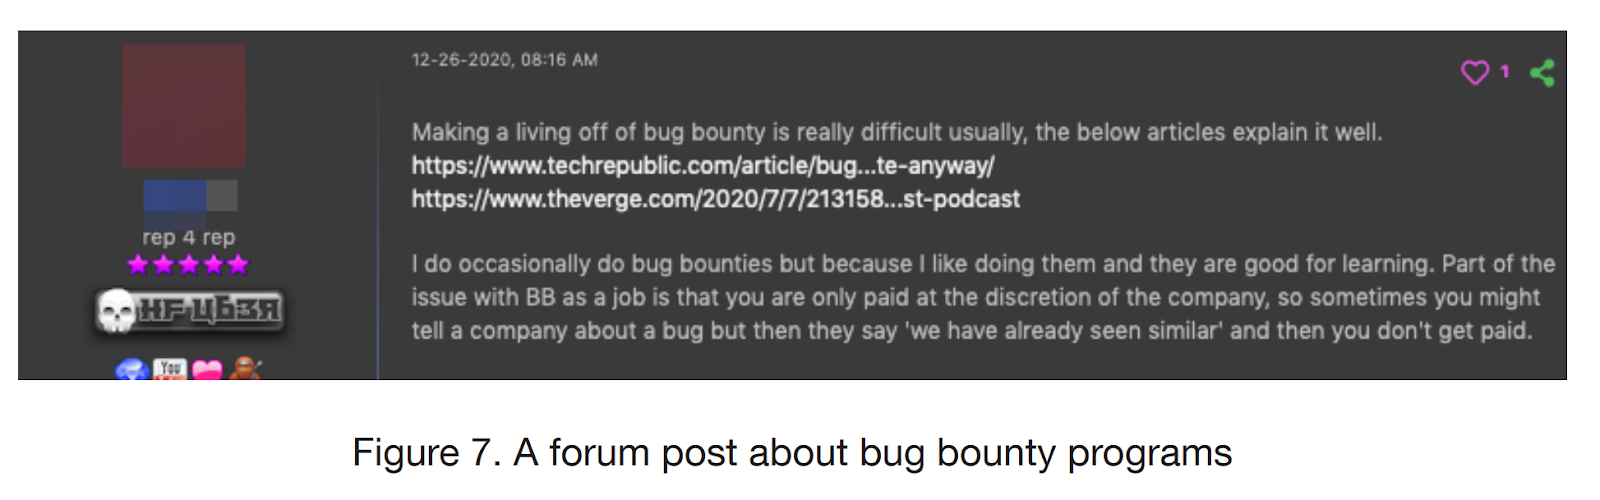 Пост с критикой программ Bug Bounty. Источник: Trend Micro